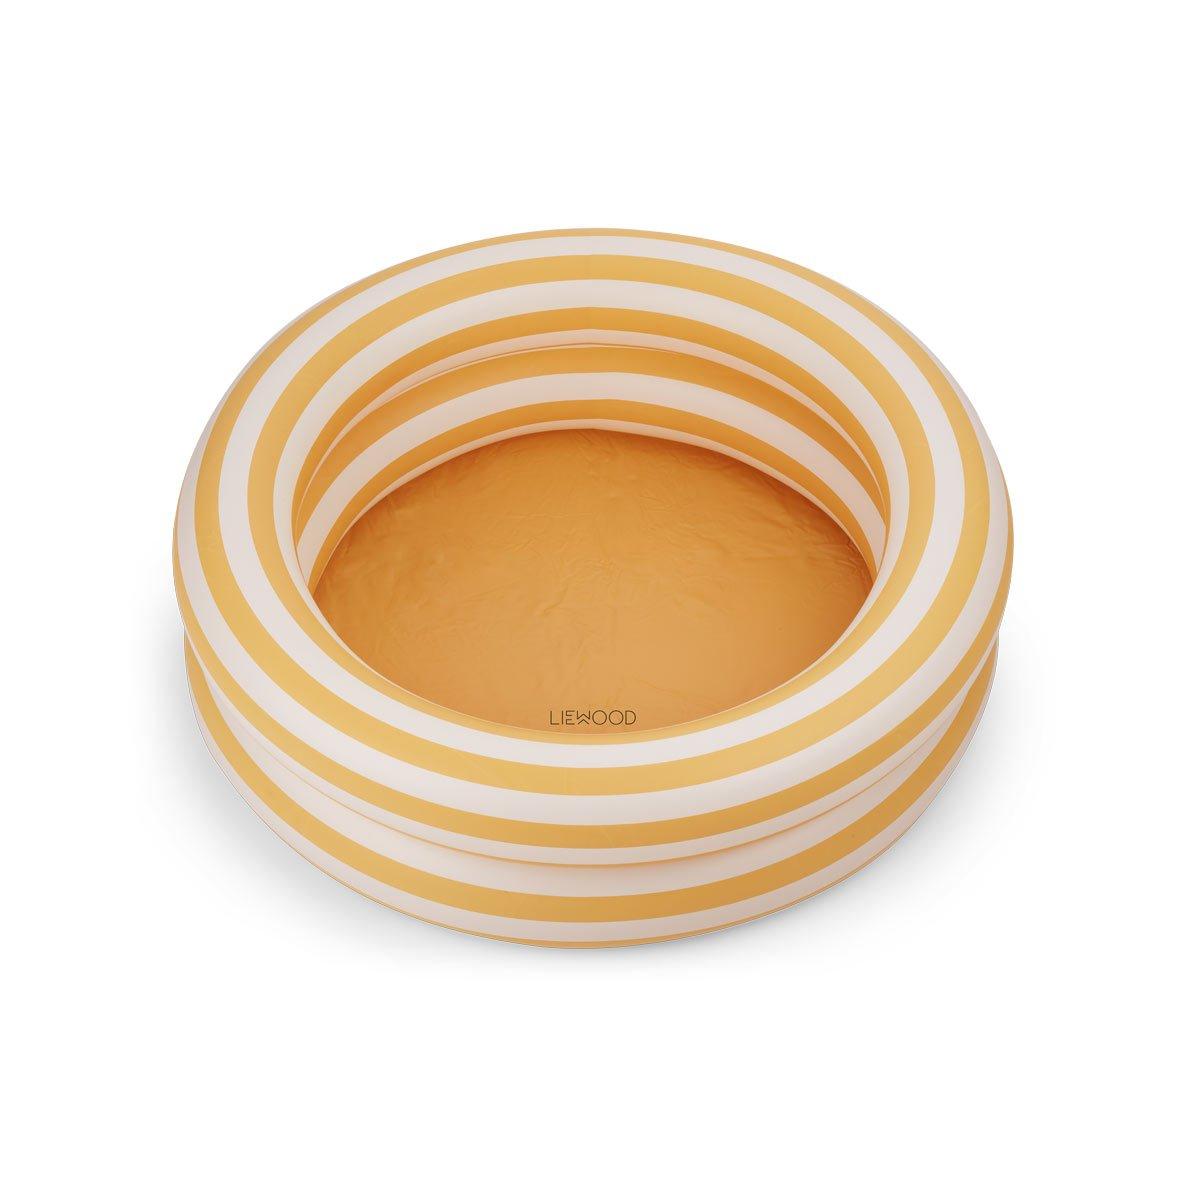 Leonore pool - Yellow mellow